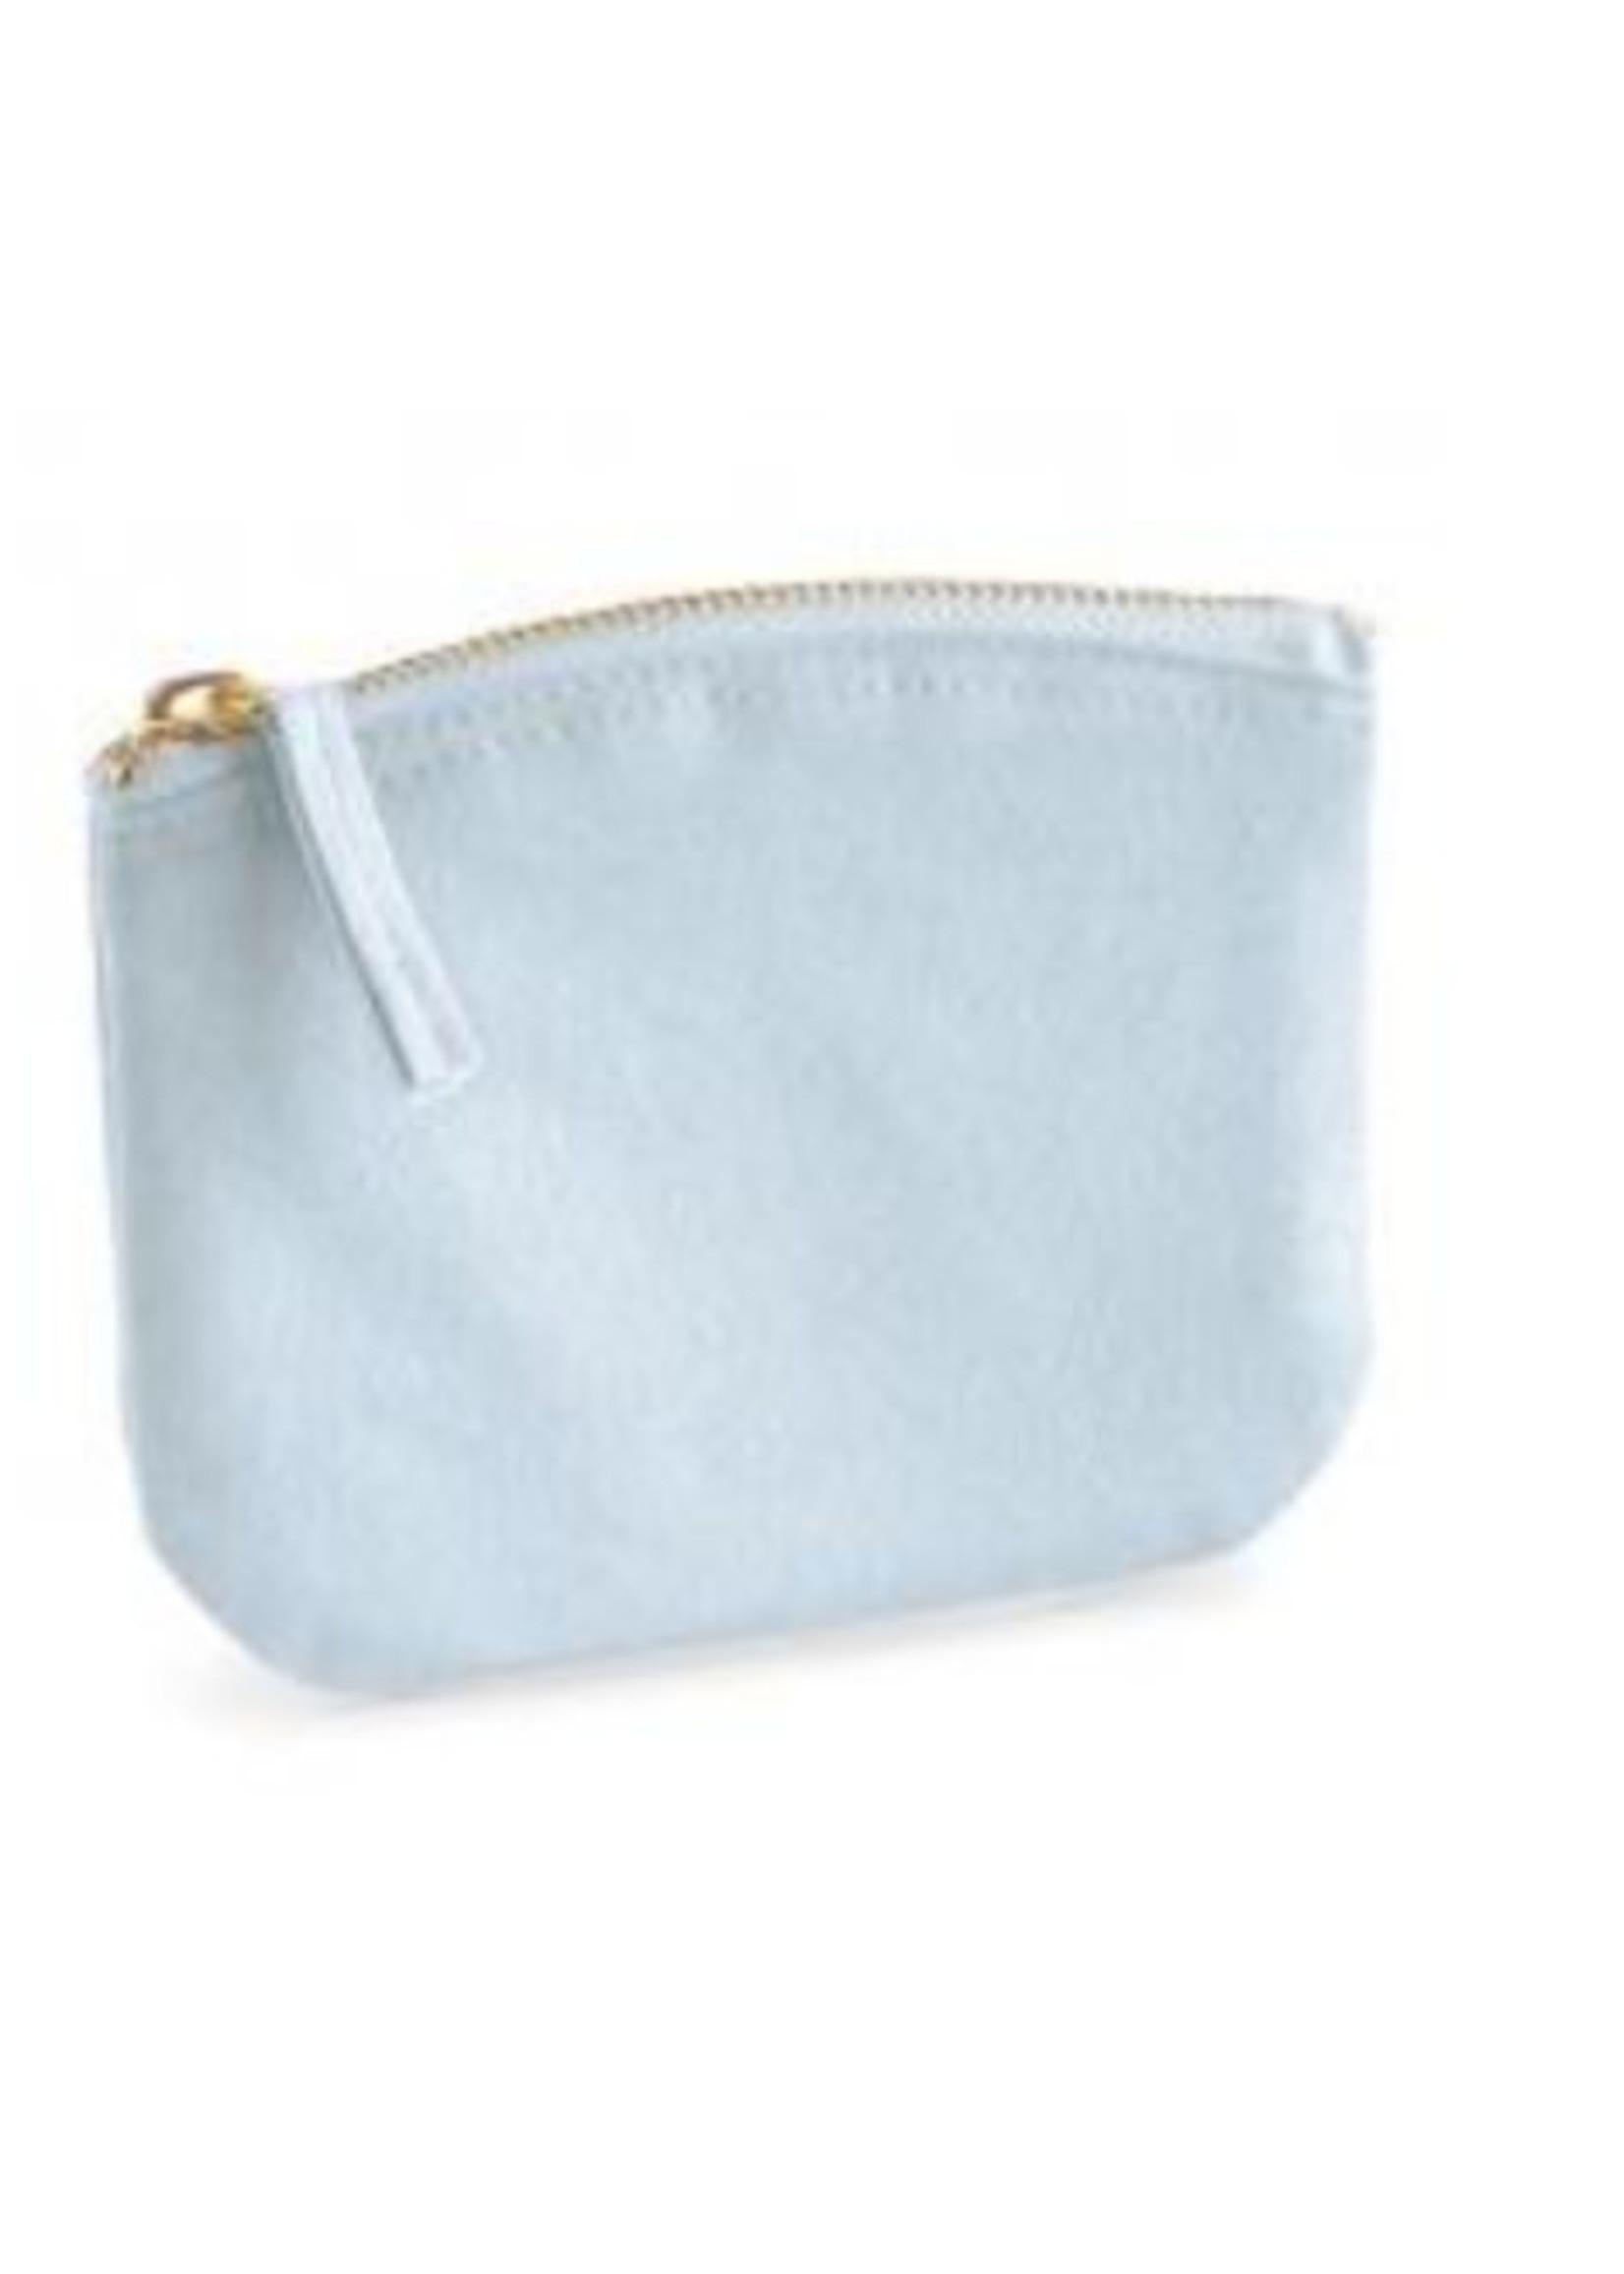 Organic Spring Purse - Pastel Blue